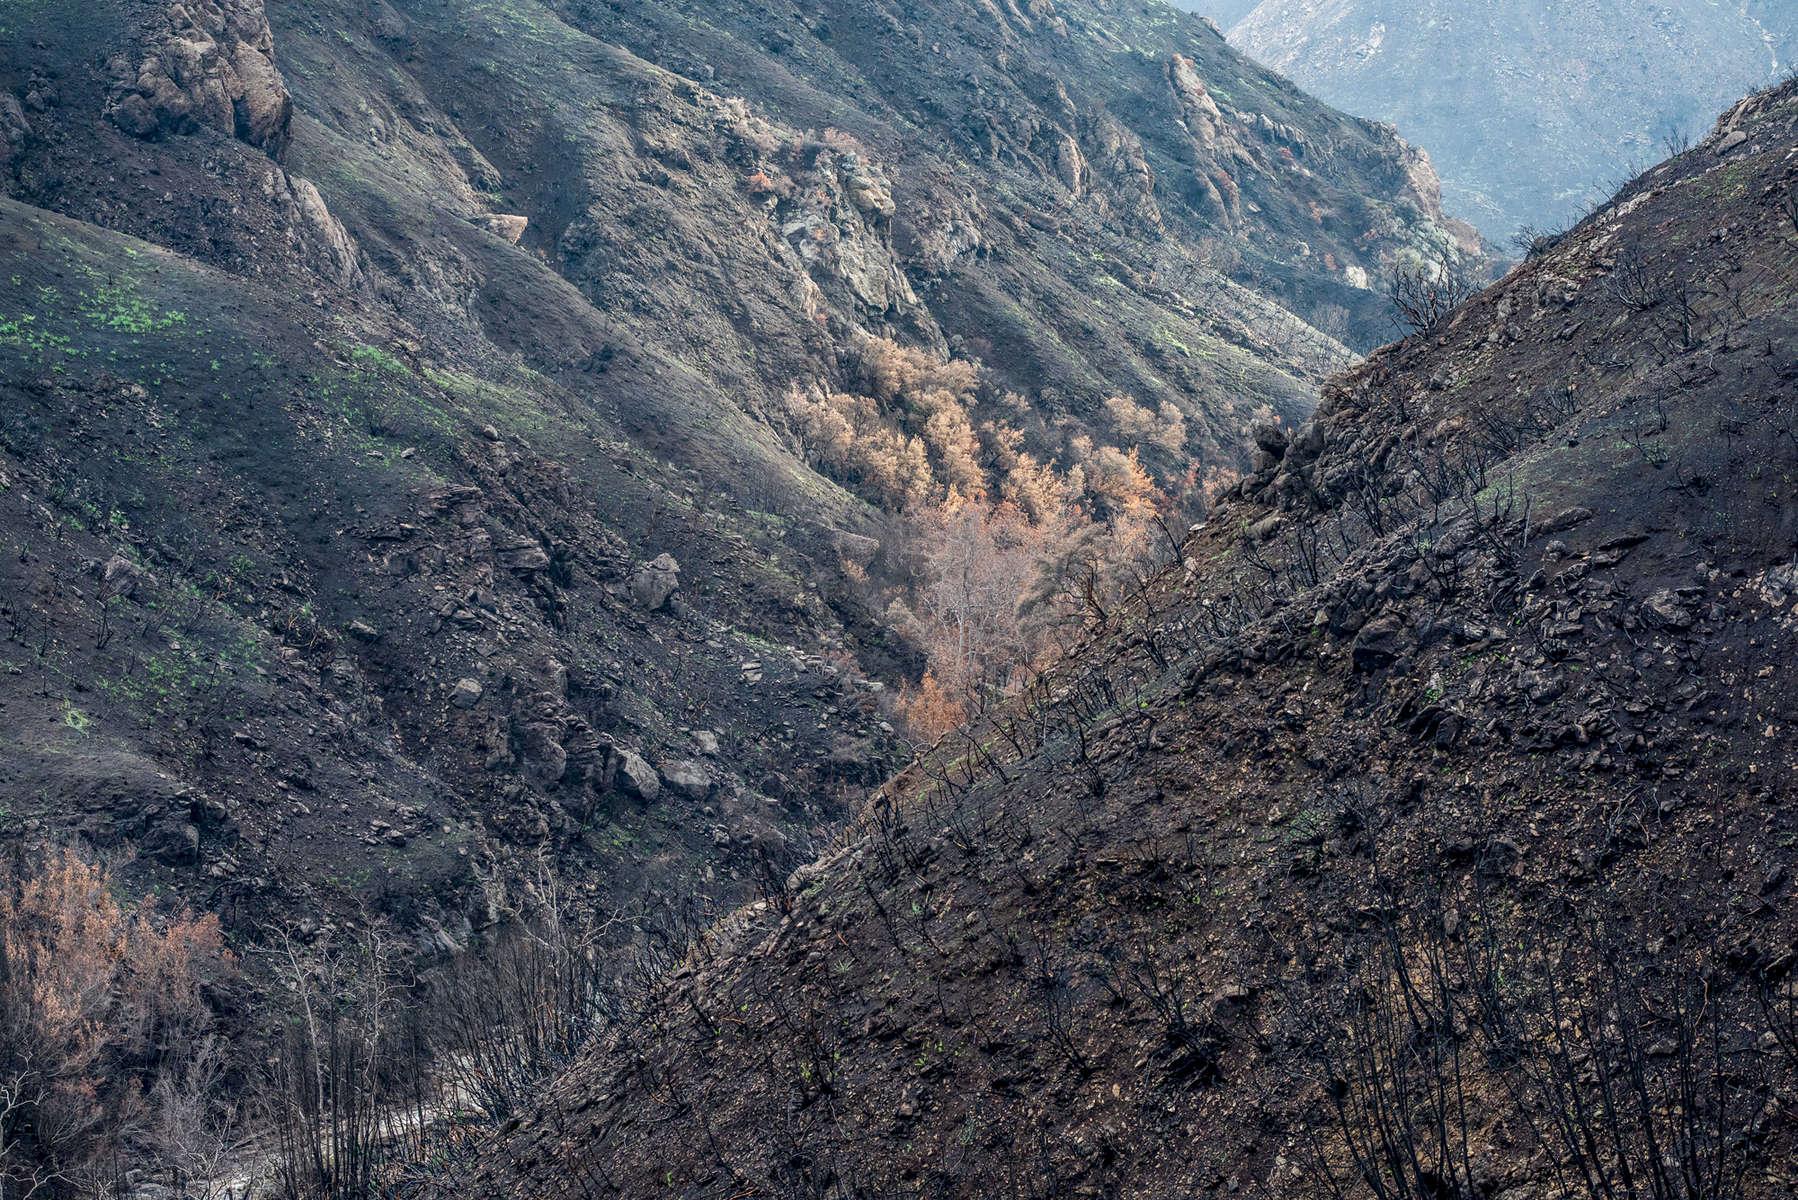 Valley of Destruction